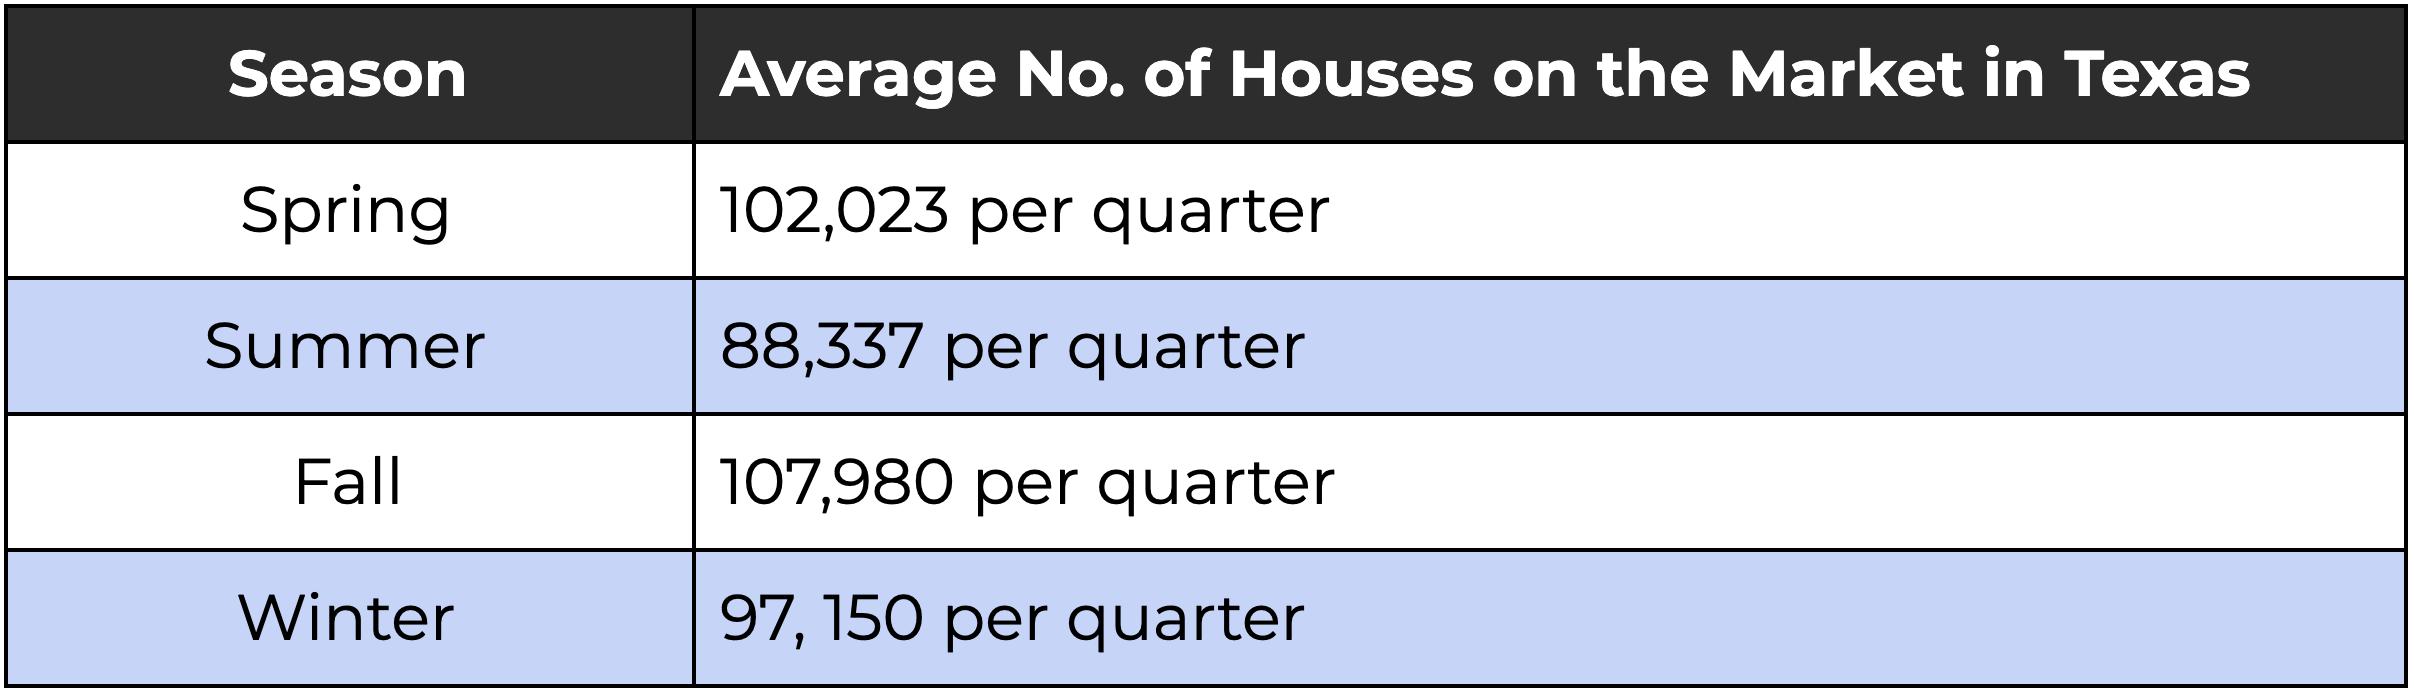 Texas Housing Inventory By Season